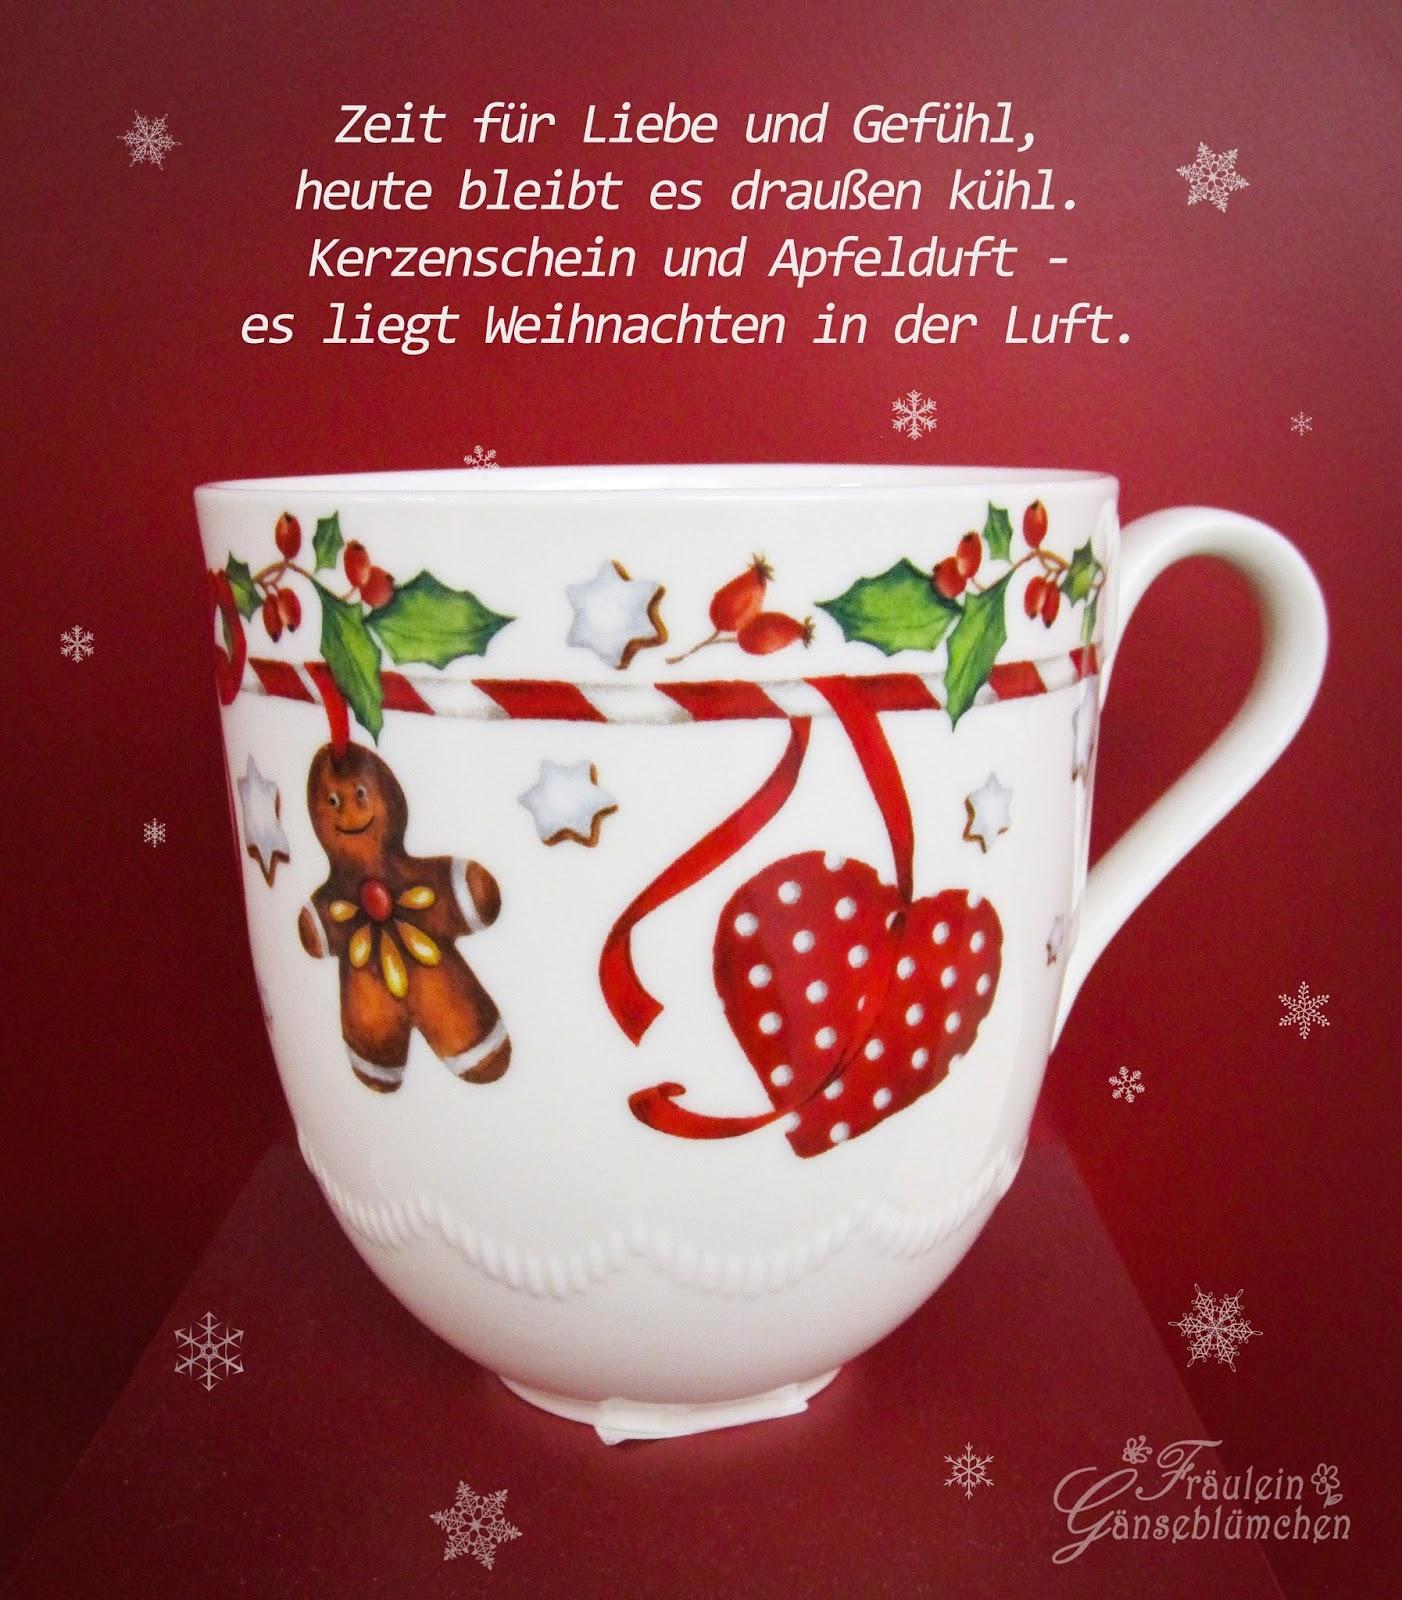 Fräulein Gänseblümchen Dezember 2013